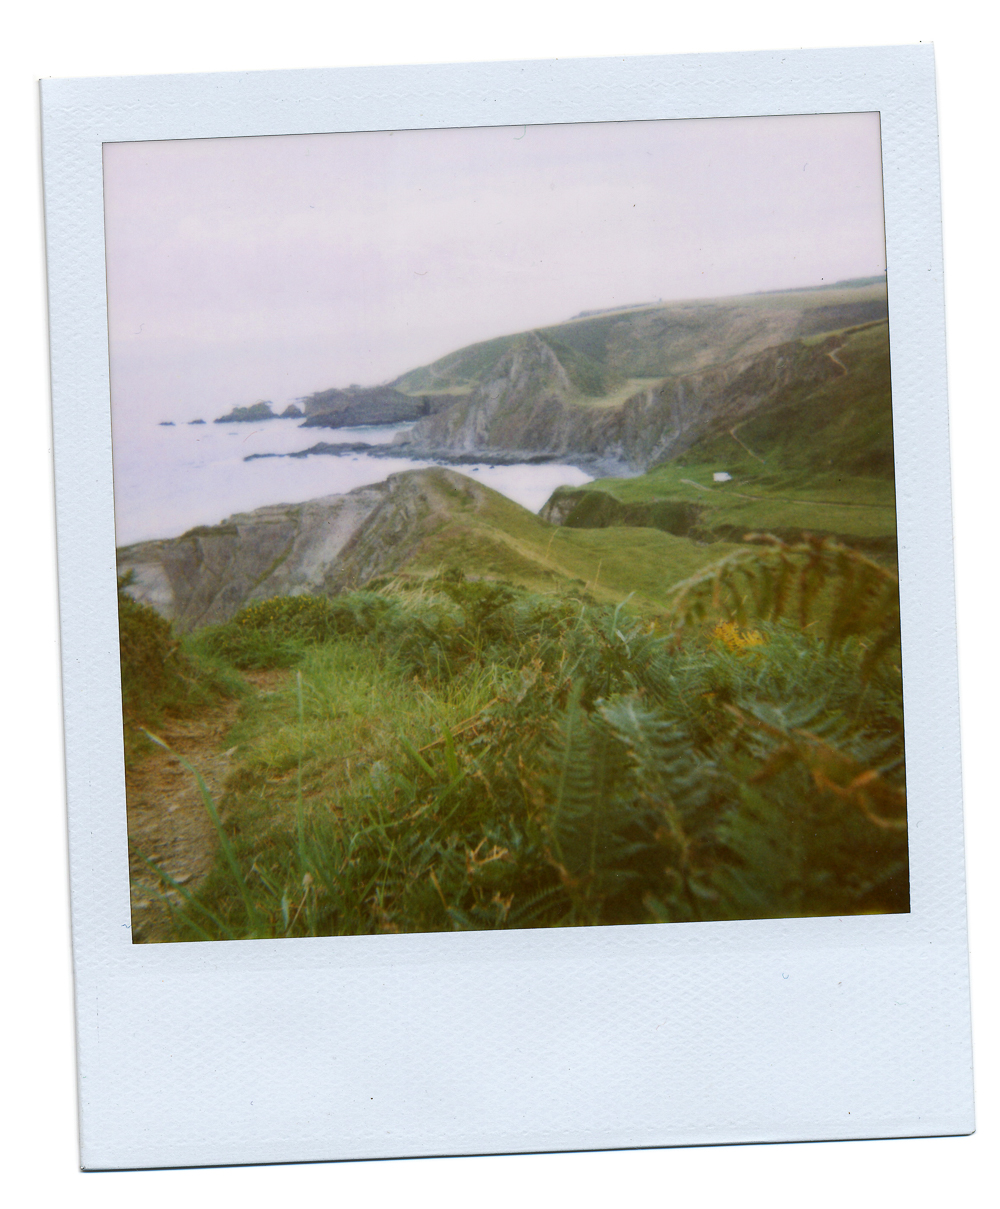 JBP_Polaroid-0001-8.jpg